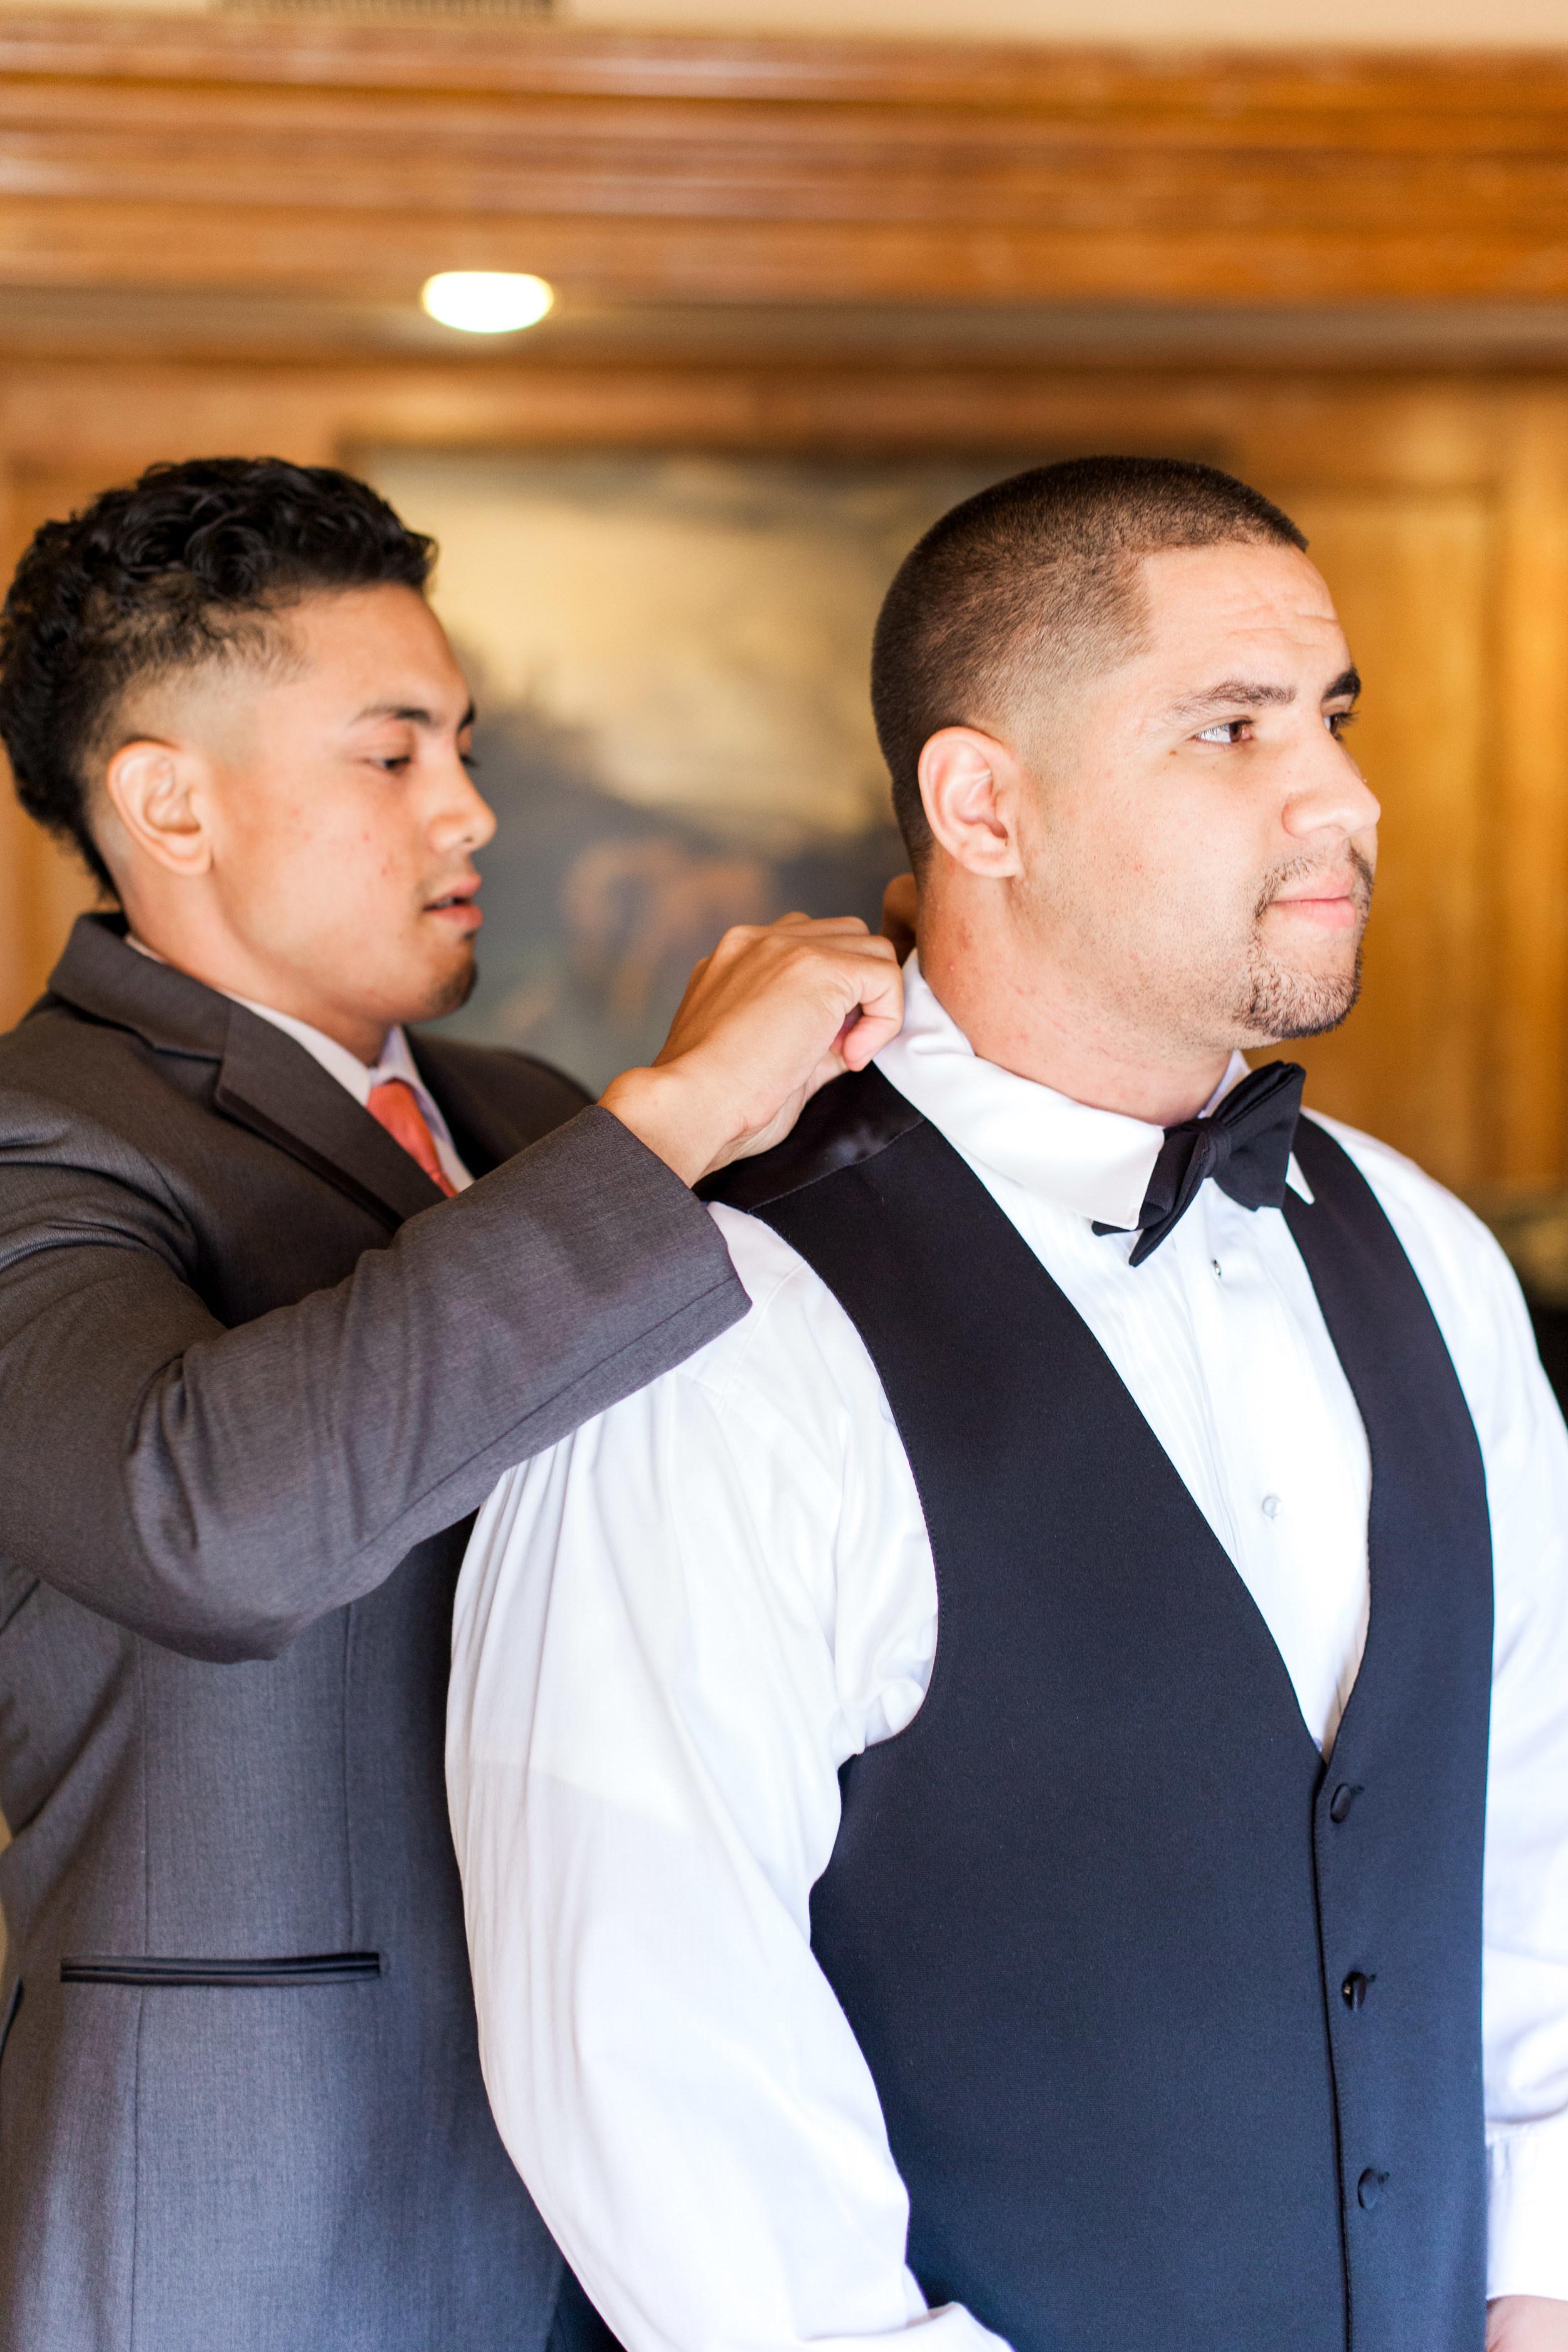 hawaiian-inspired-wedding-at-blackhawk-country-club-3892.jpg